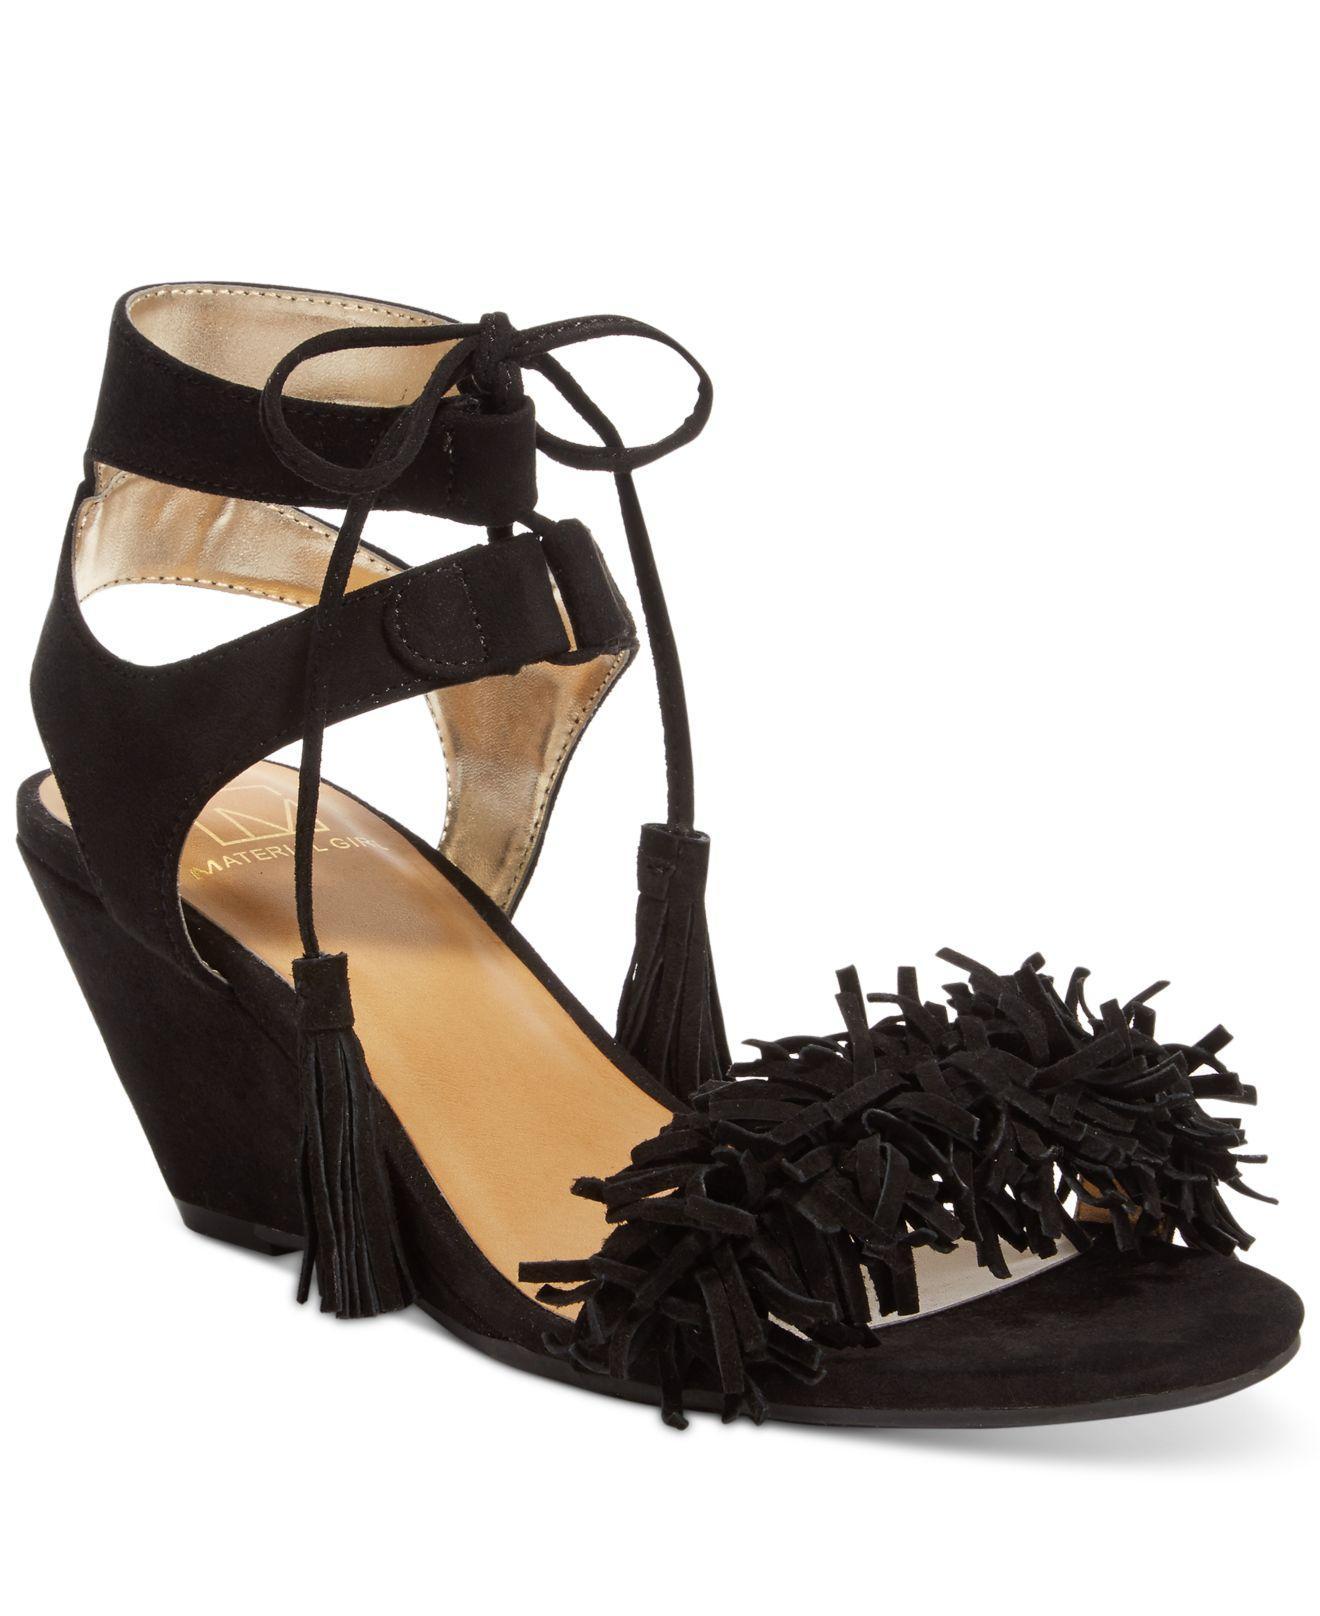 5c243ed50 Lyst - Material Girl Haniya Fringe Wedge Sandals in Black